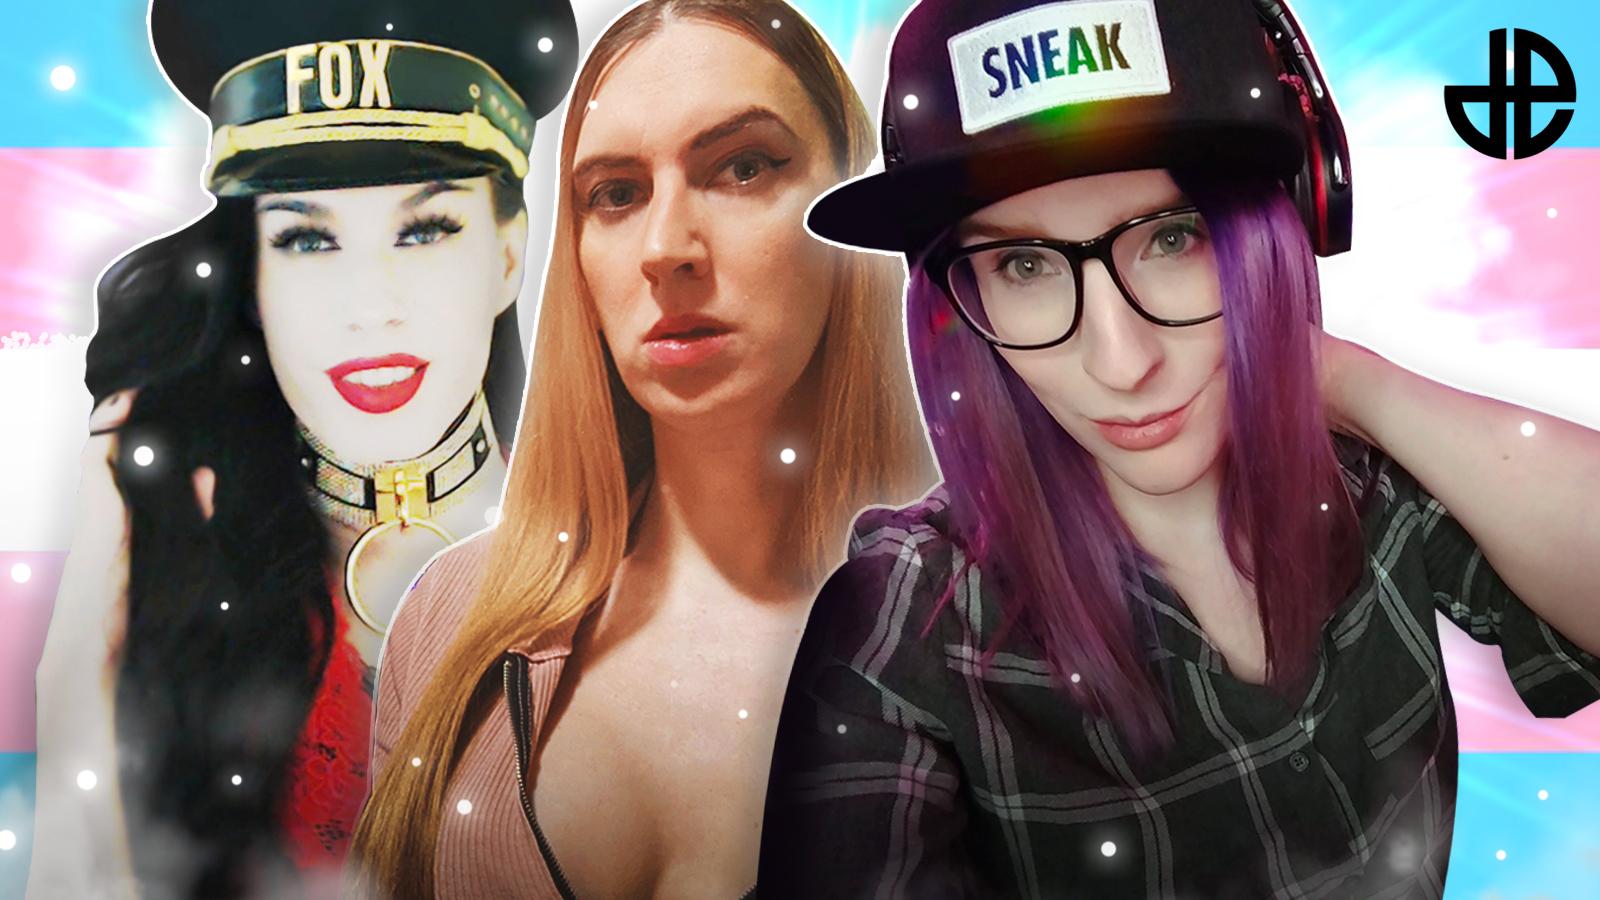 MSTRSSFOX, Elle Rows and Miabyte Trans Twitch Streamers